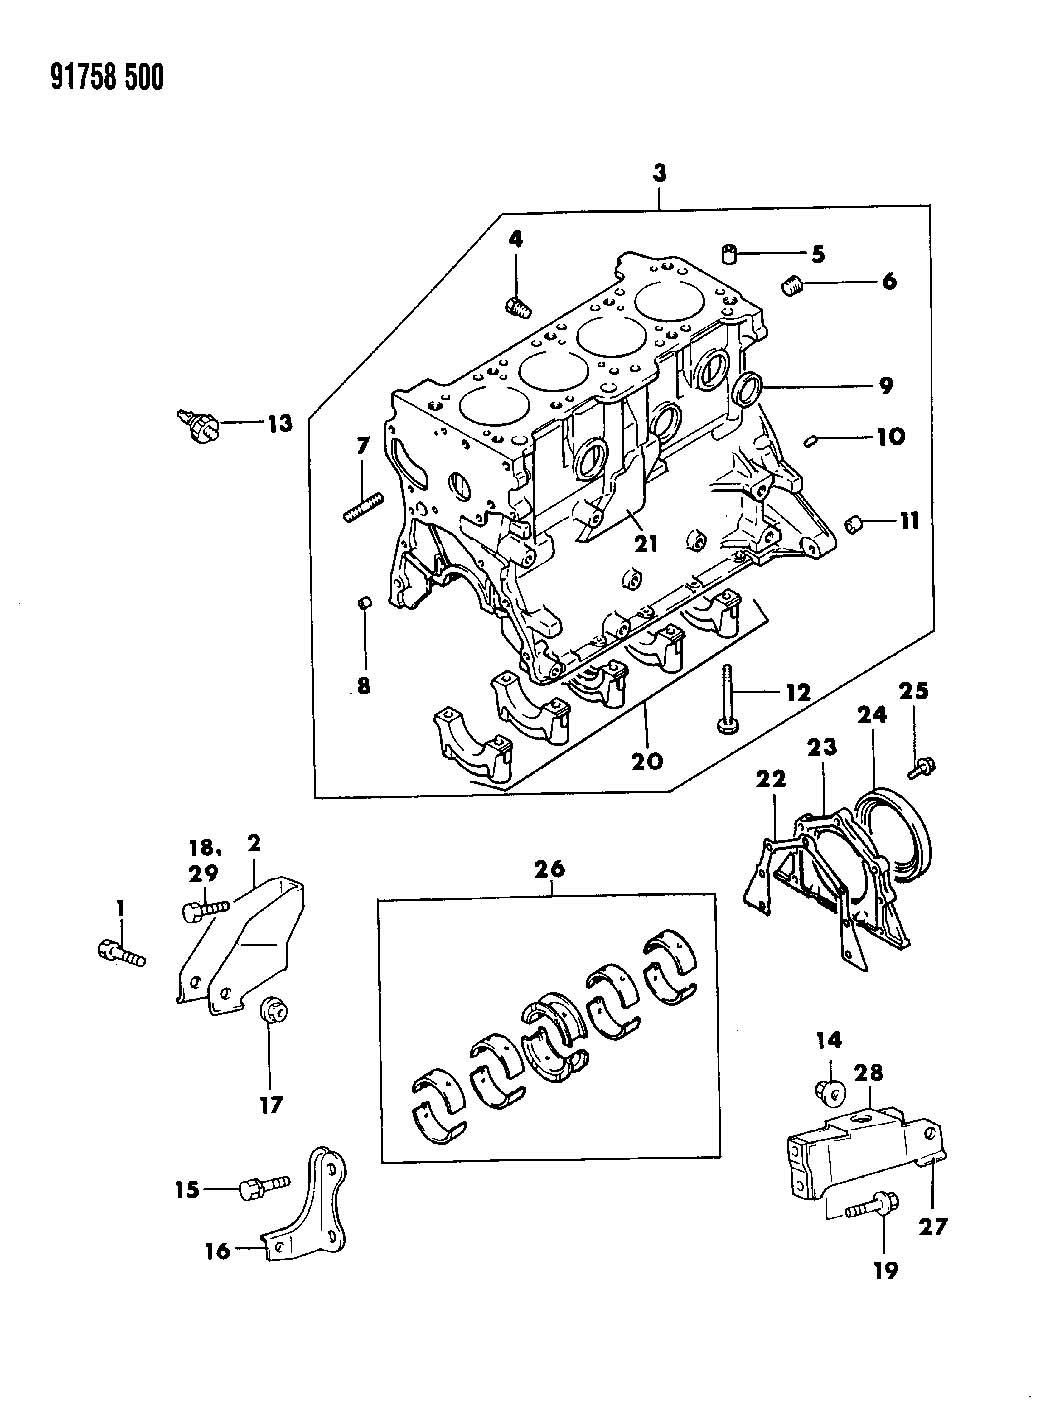 Chrysler Voyager Plug. Instrument panel switch. Cylinder